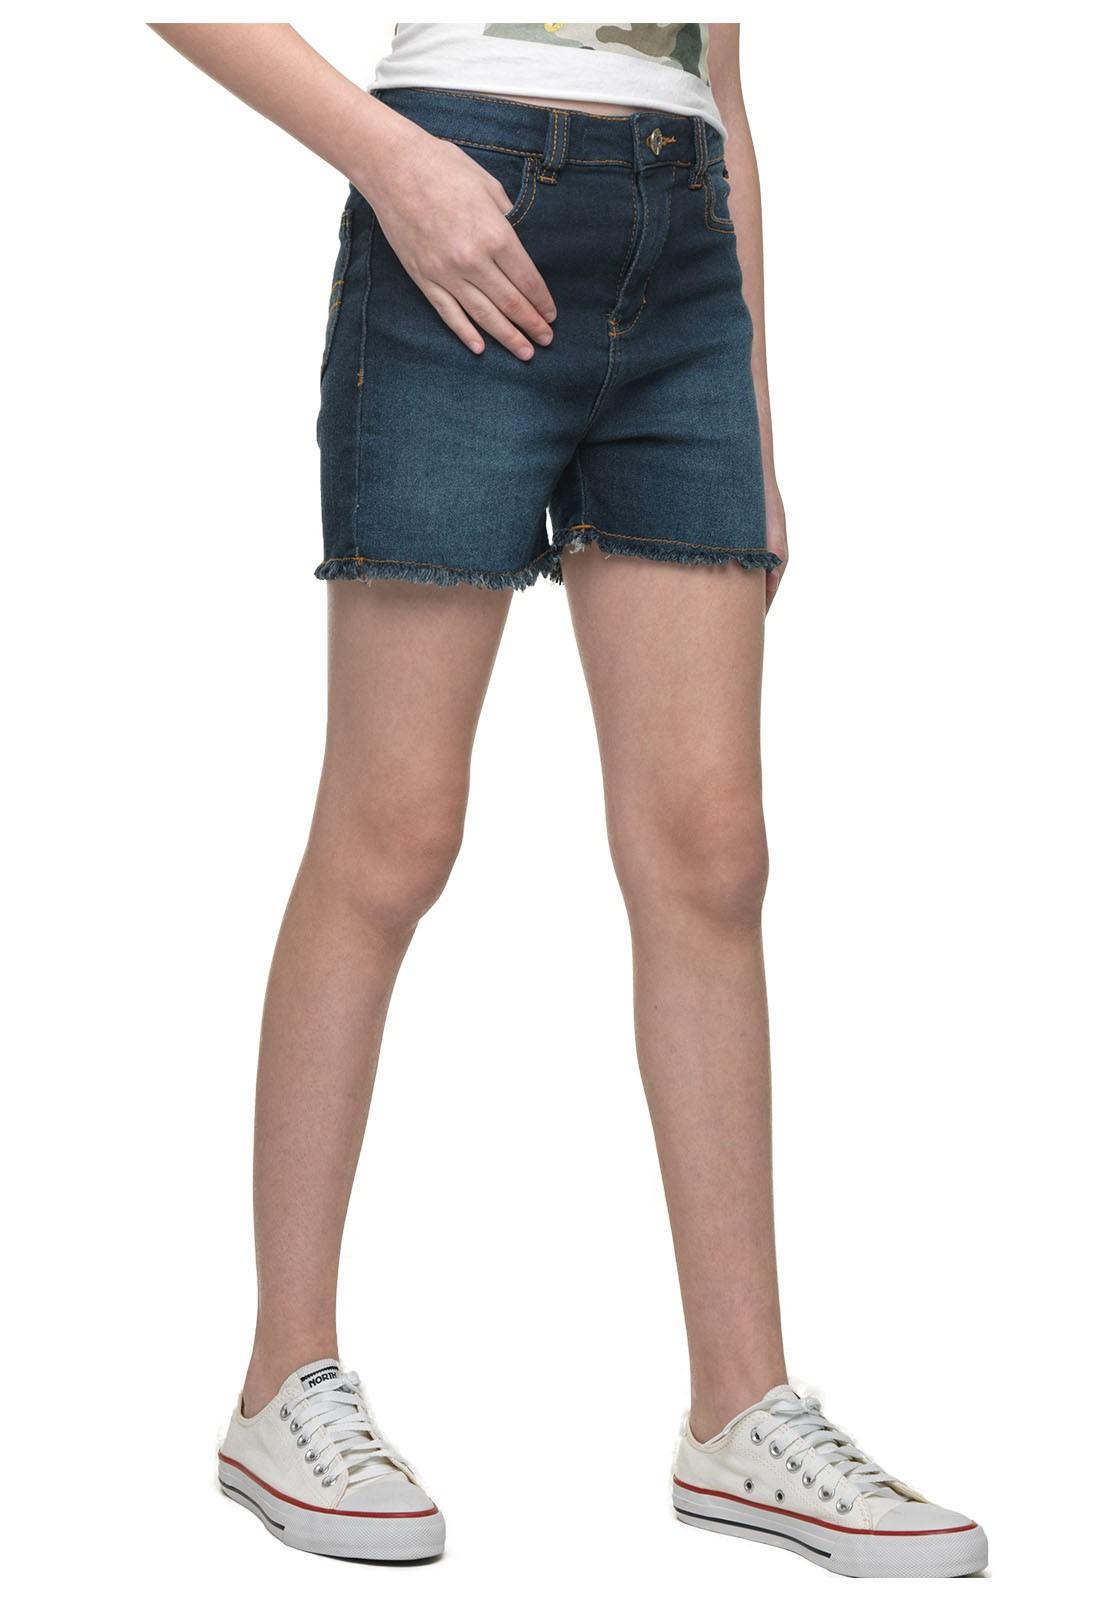 Shorts Jeans Moletom Feminino Crawling